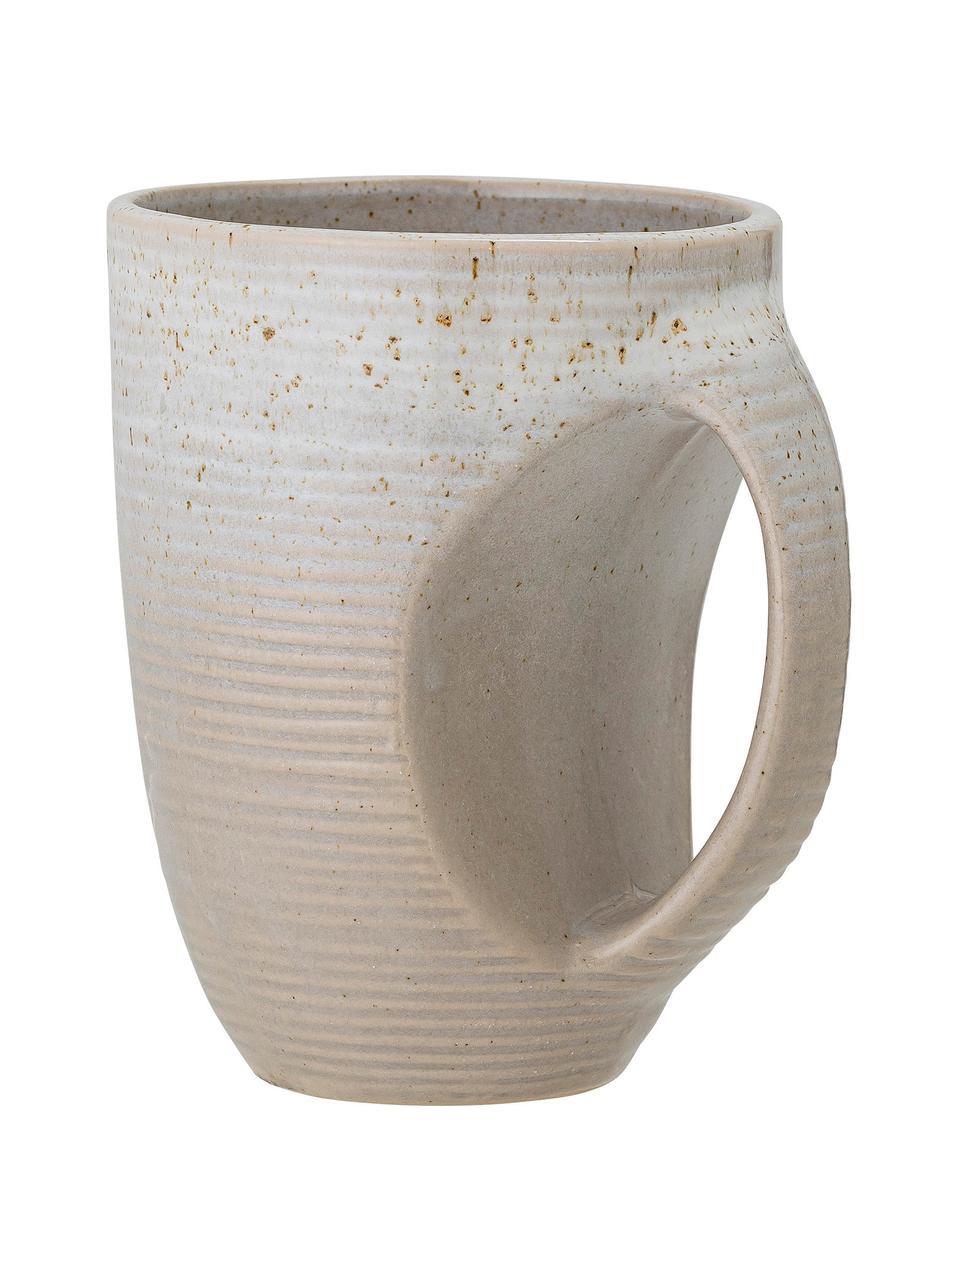 Kaffeetassen Taupe mit handgefertigter Sprenkelglasur, 2 Stück, Steingut, Grau, Ø 10 x H 13 cm